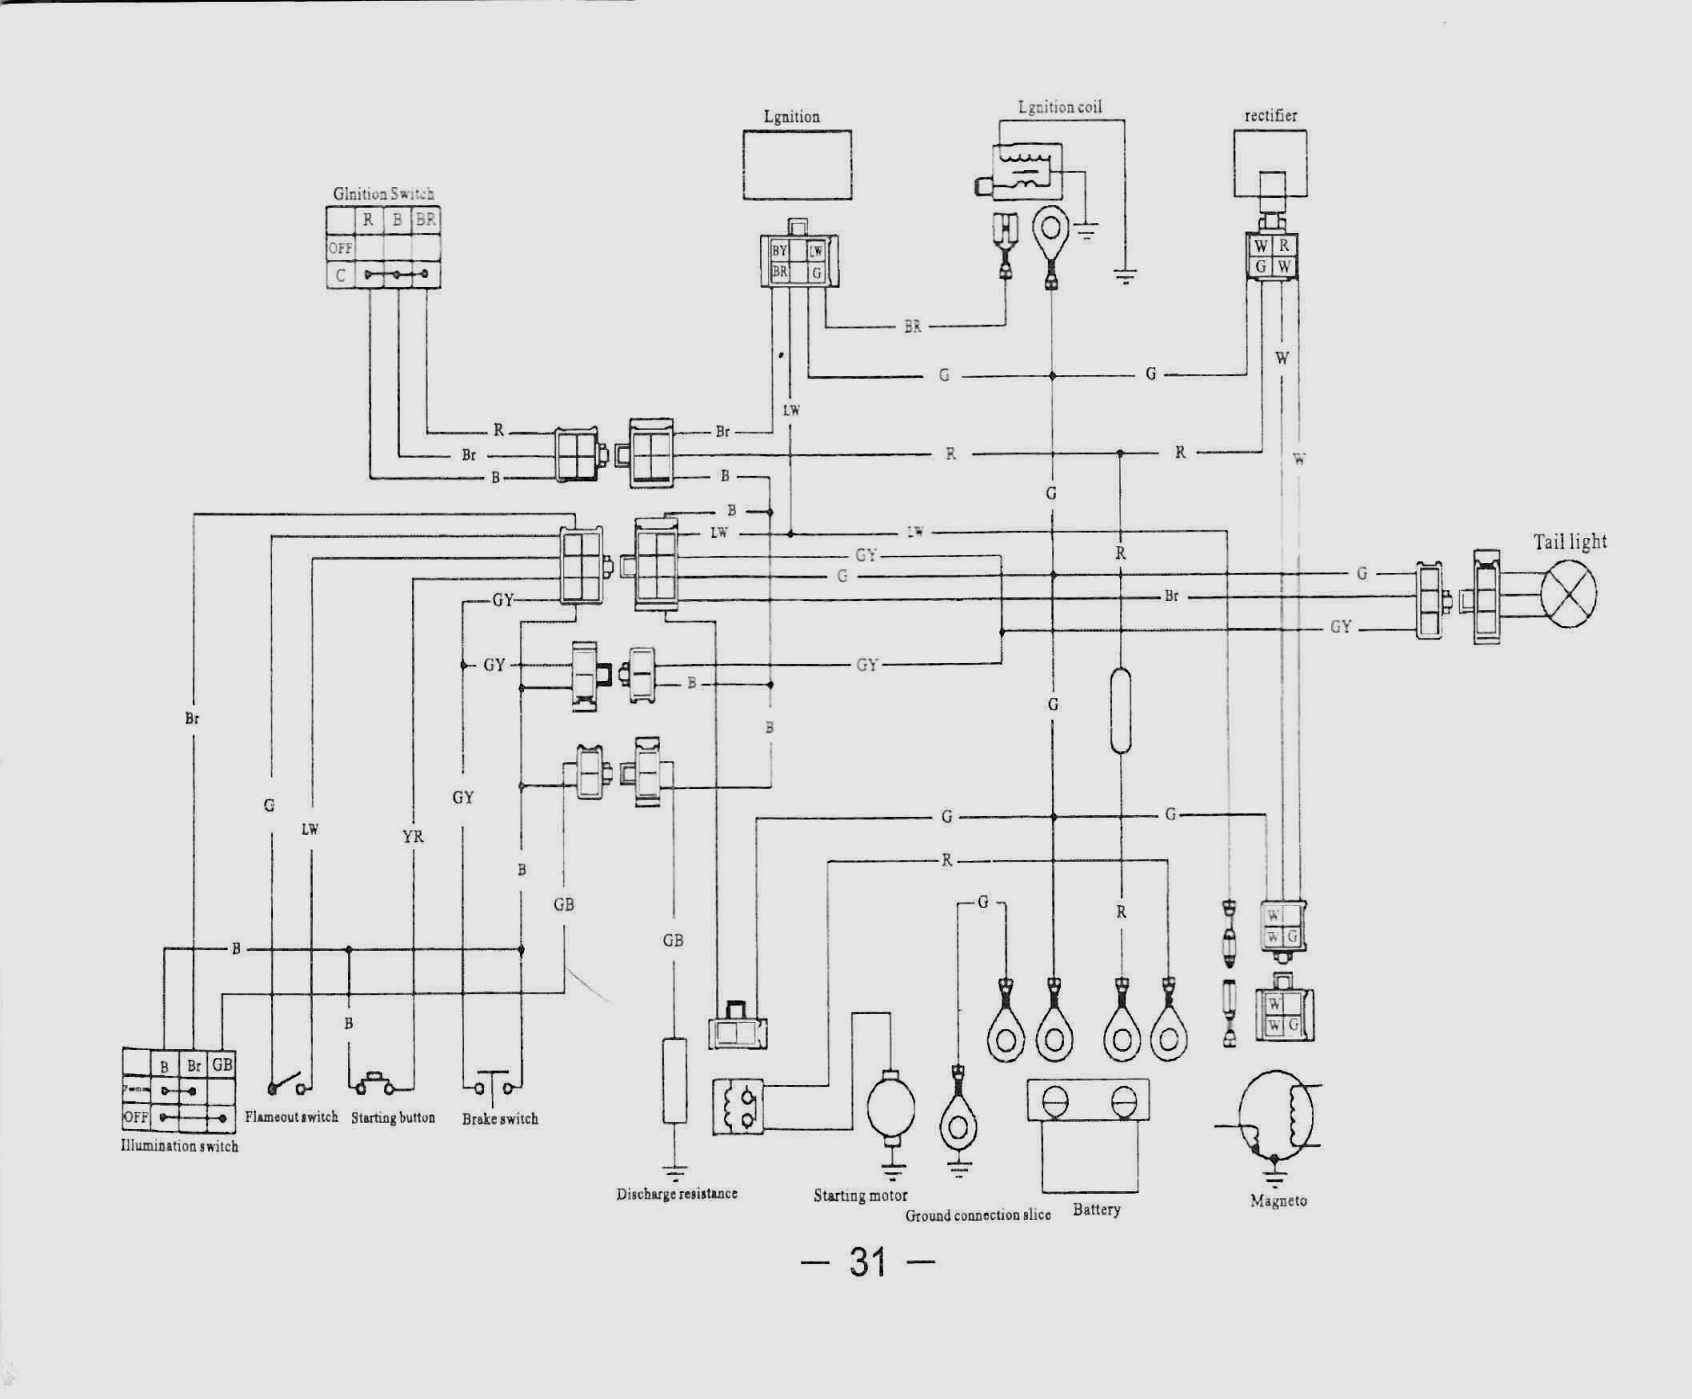 redcat wiring diagram kazuma 150 wire diagram e2 wiring diagram  kazuma 150 wire diagram e2 wiring diagram